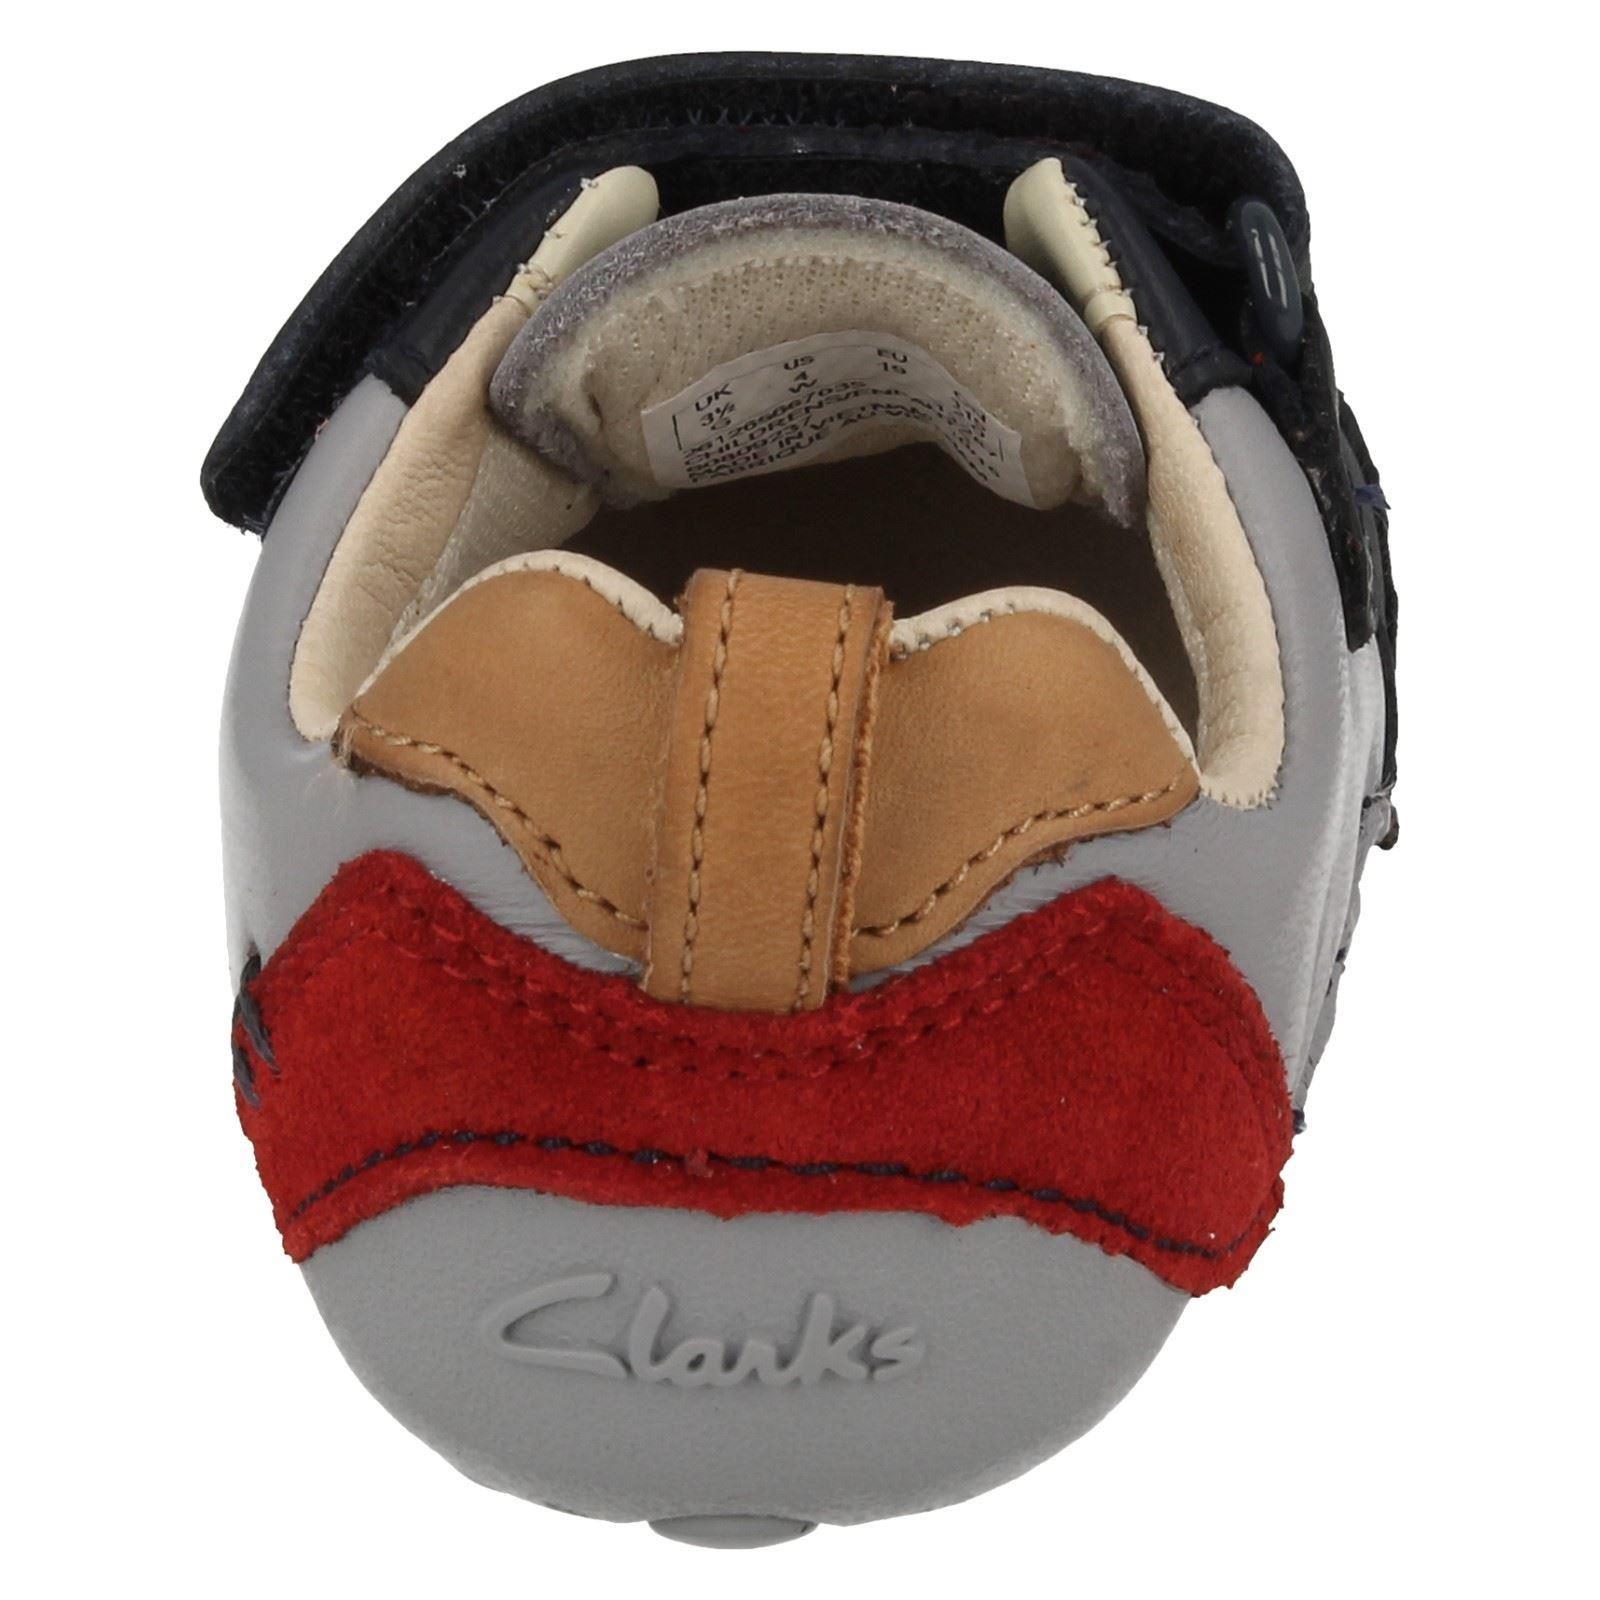 Clarks Boys First Cruisers - Tiny Cap